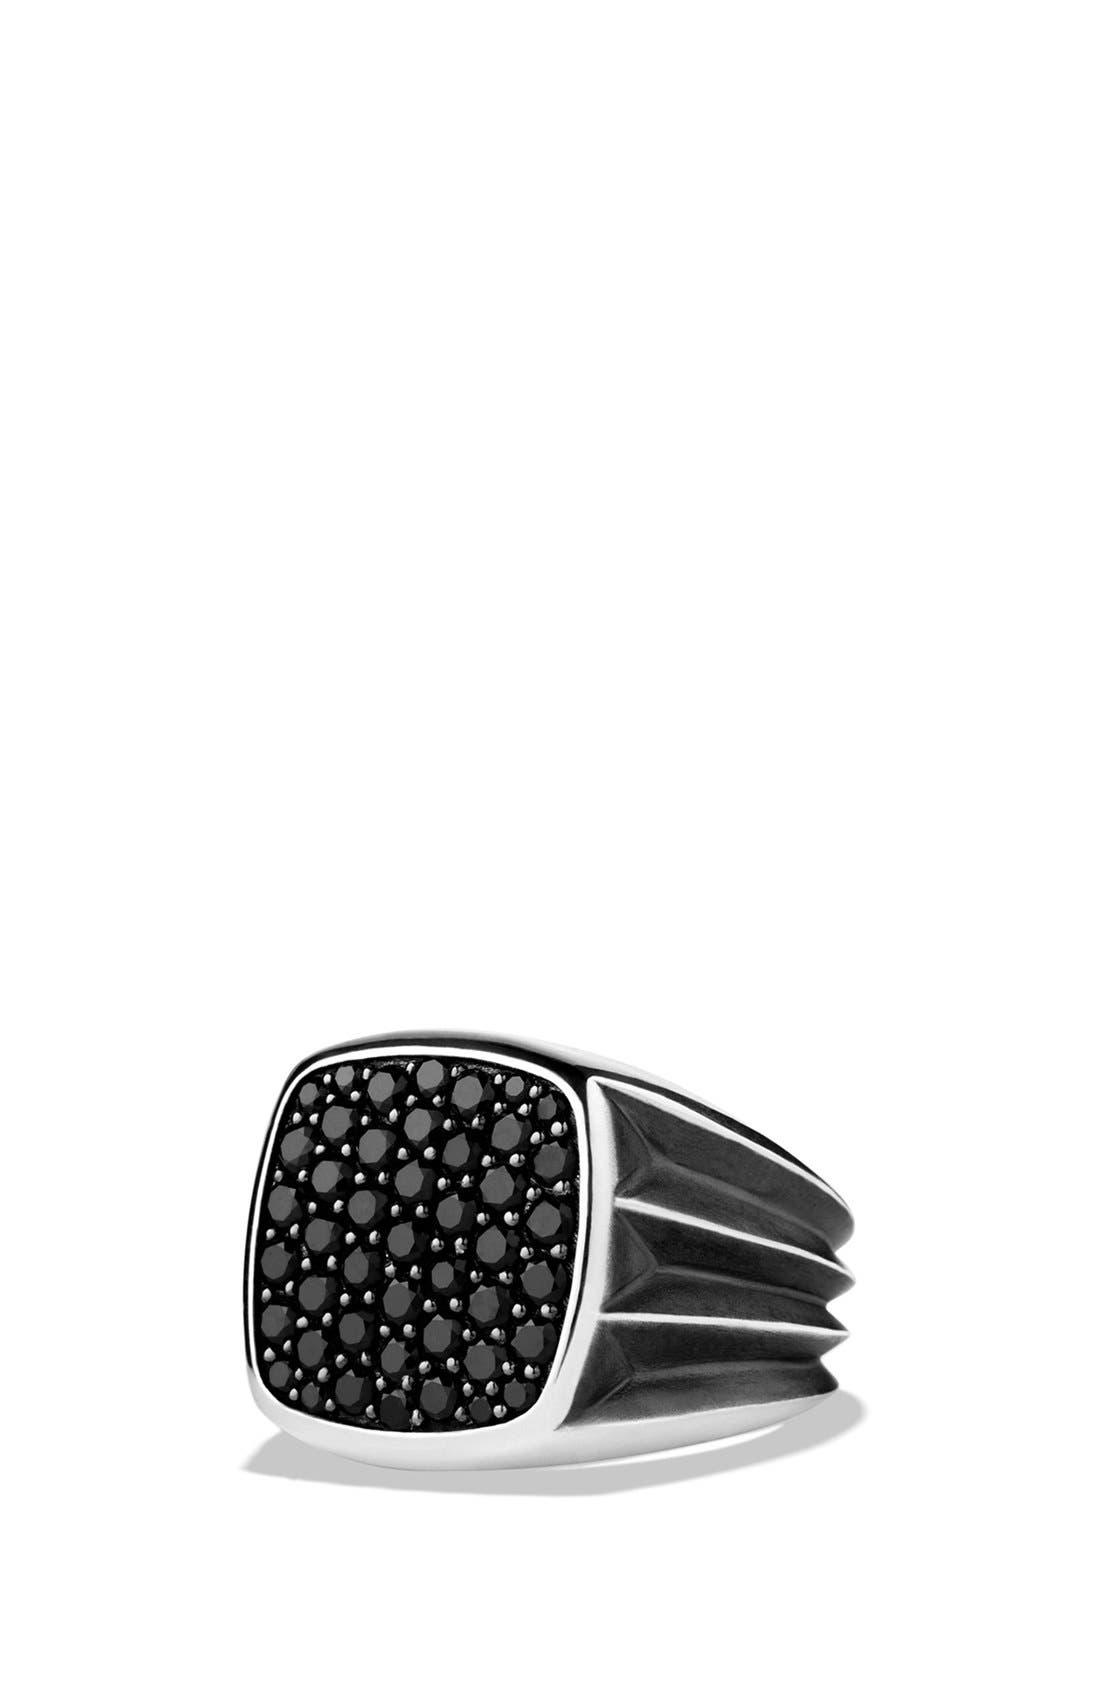 Main Image - David Yurman 'Knife Edge' Signet Ring with Black Diamonds